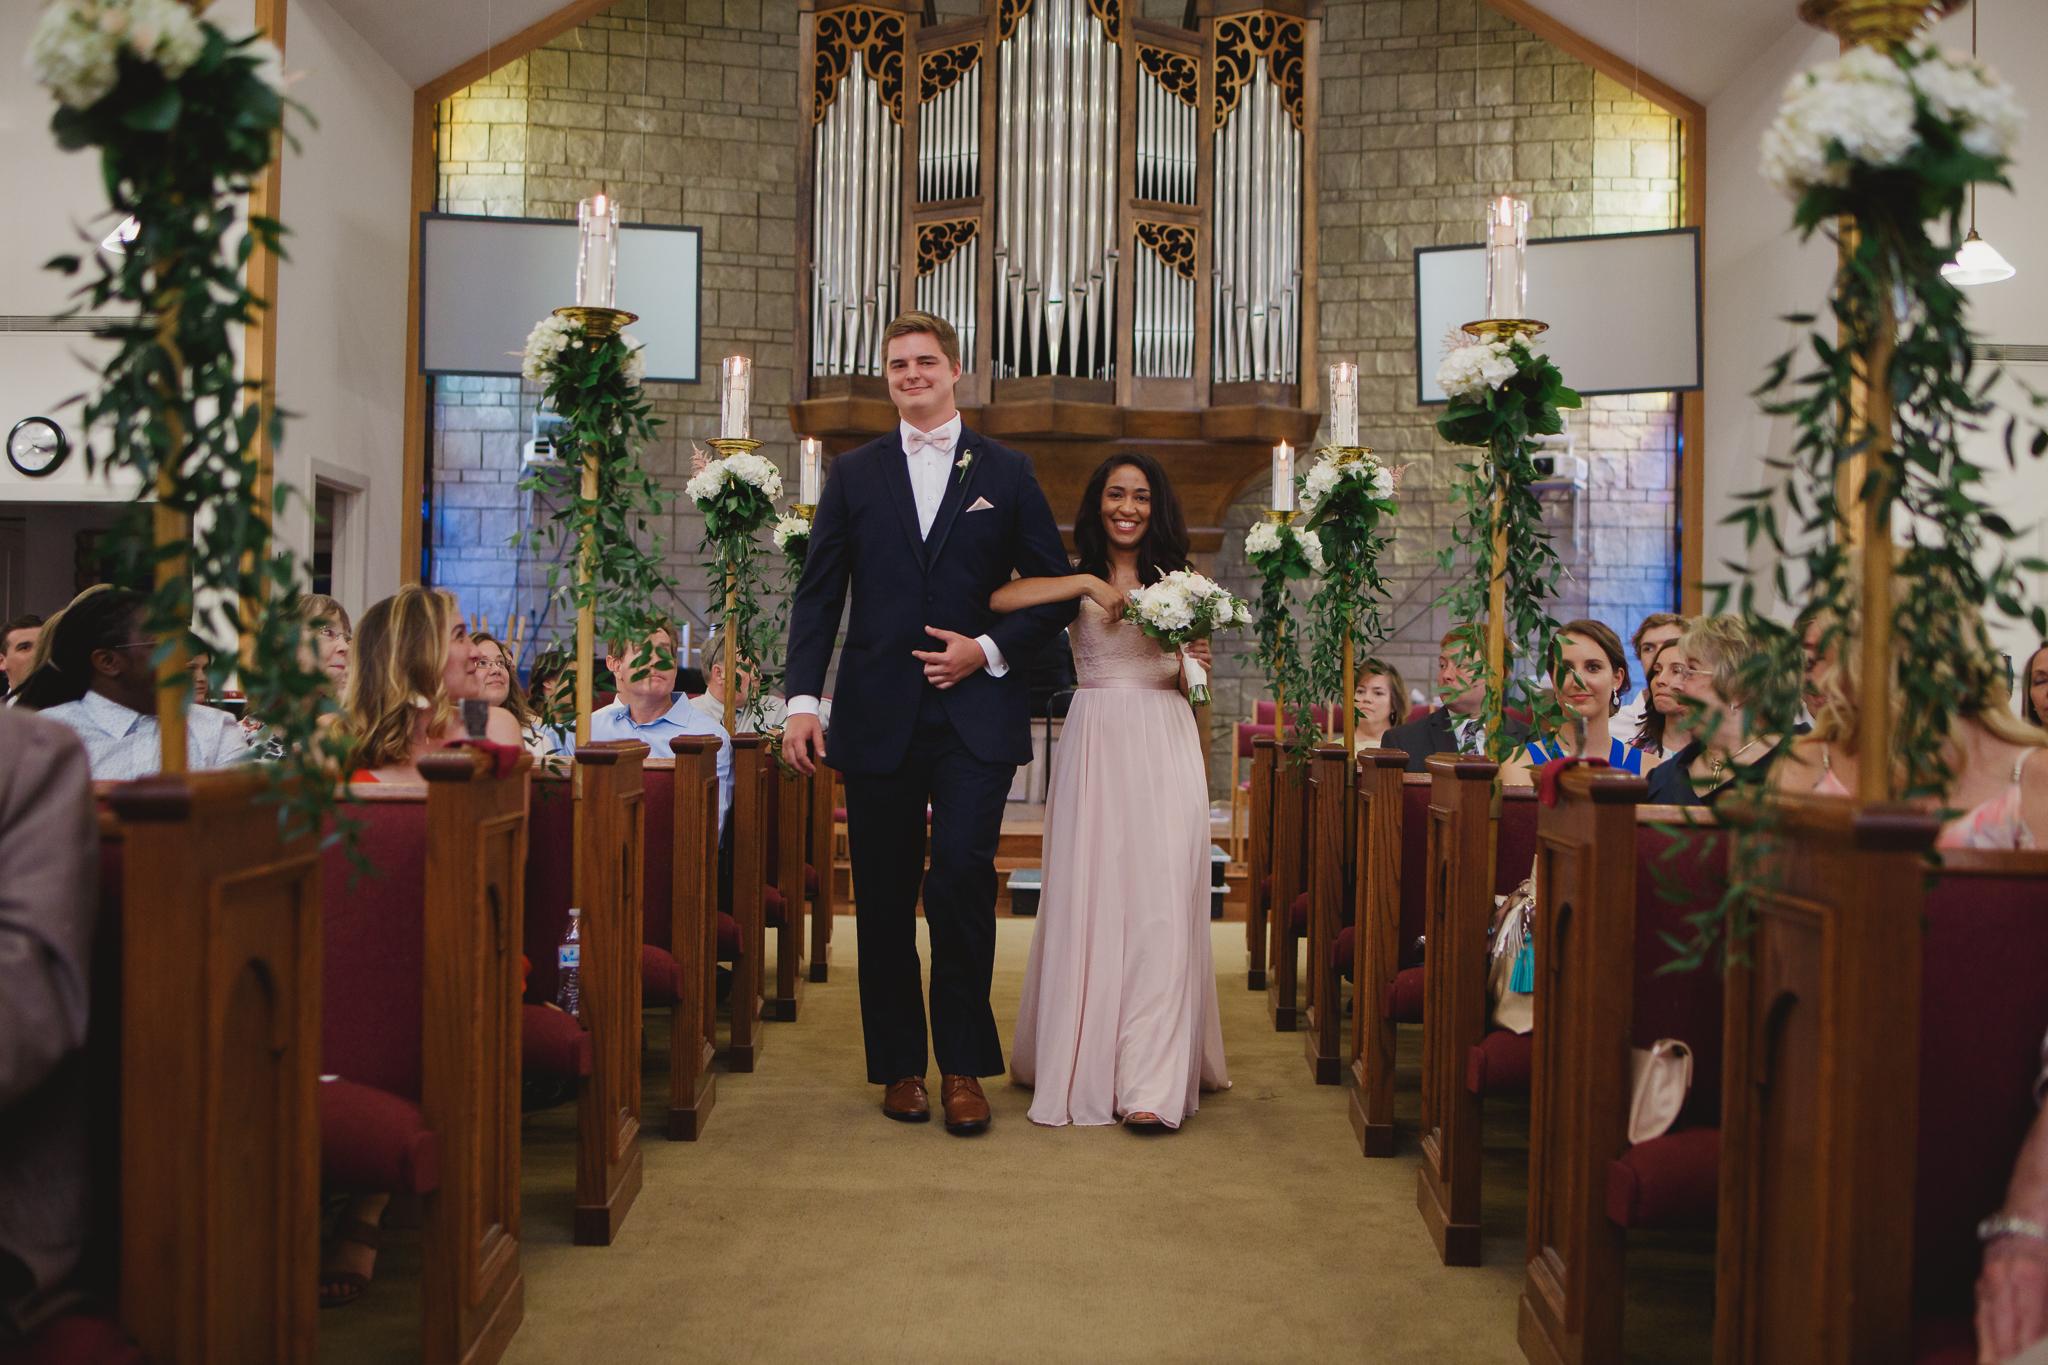 Michael and Kelly - the ashton depot - wedding DFW - wedding photographer- elizalde photography (21 of 150).jpg